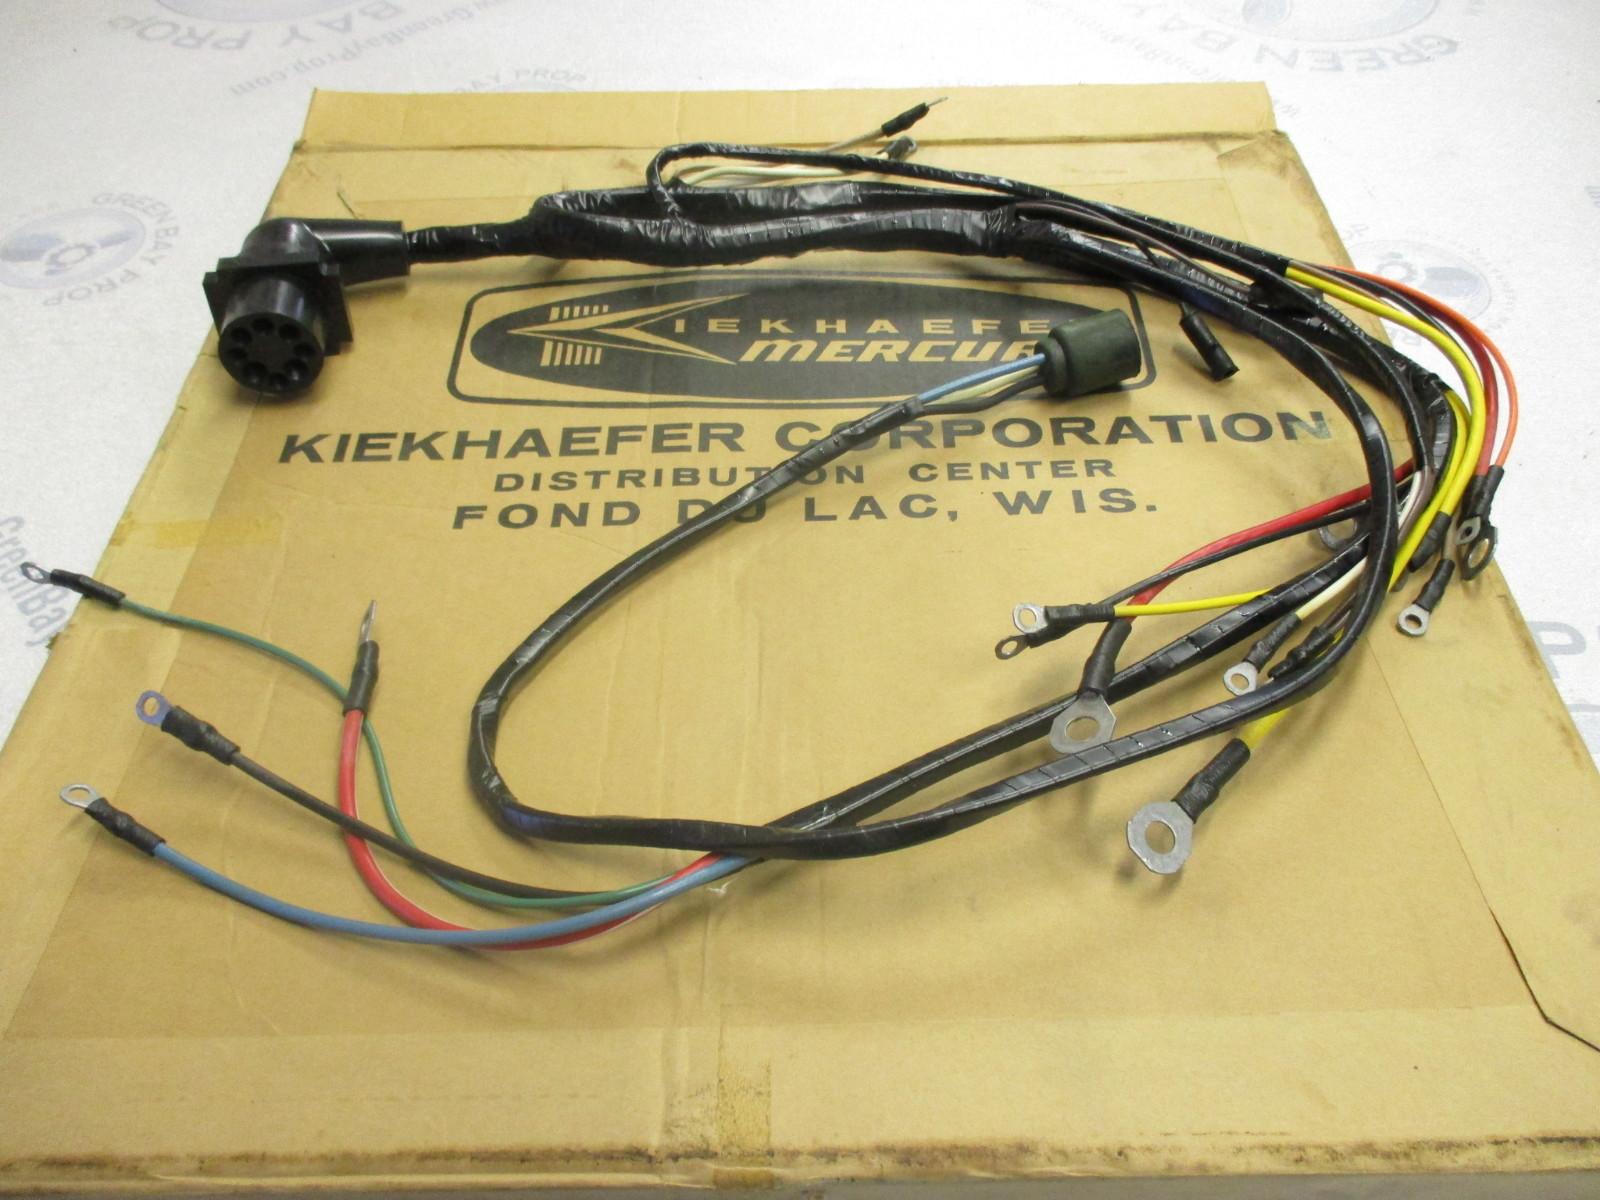 Wiring Harness For Mercury Outboard Motor : A mercury kiekhaefer engine motor marine wire